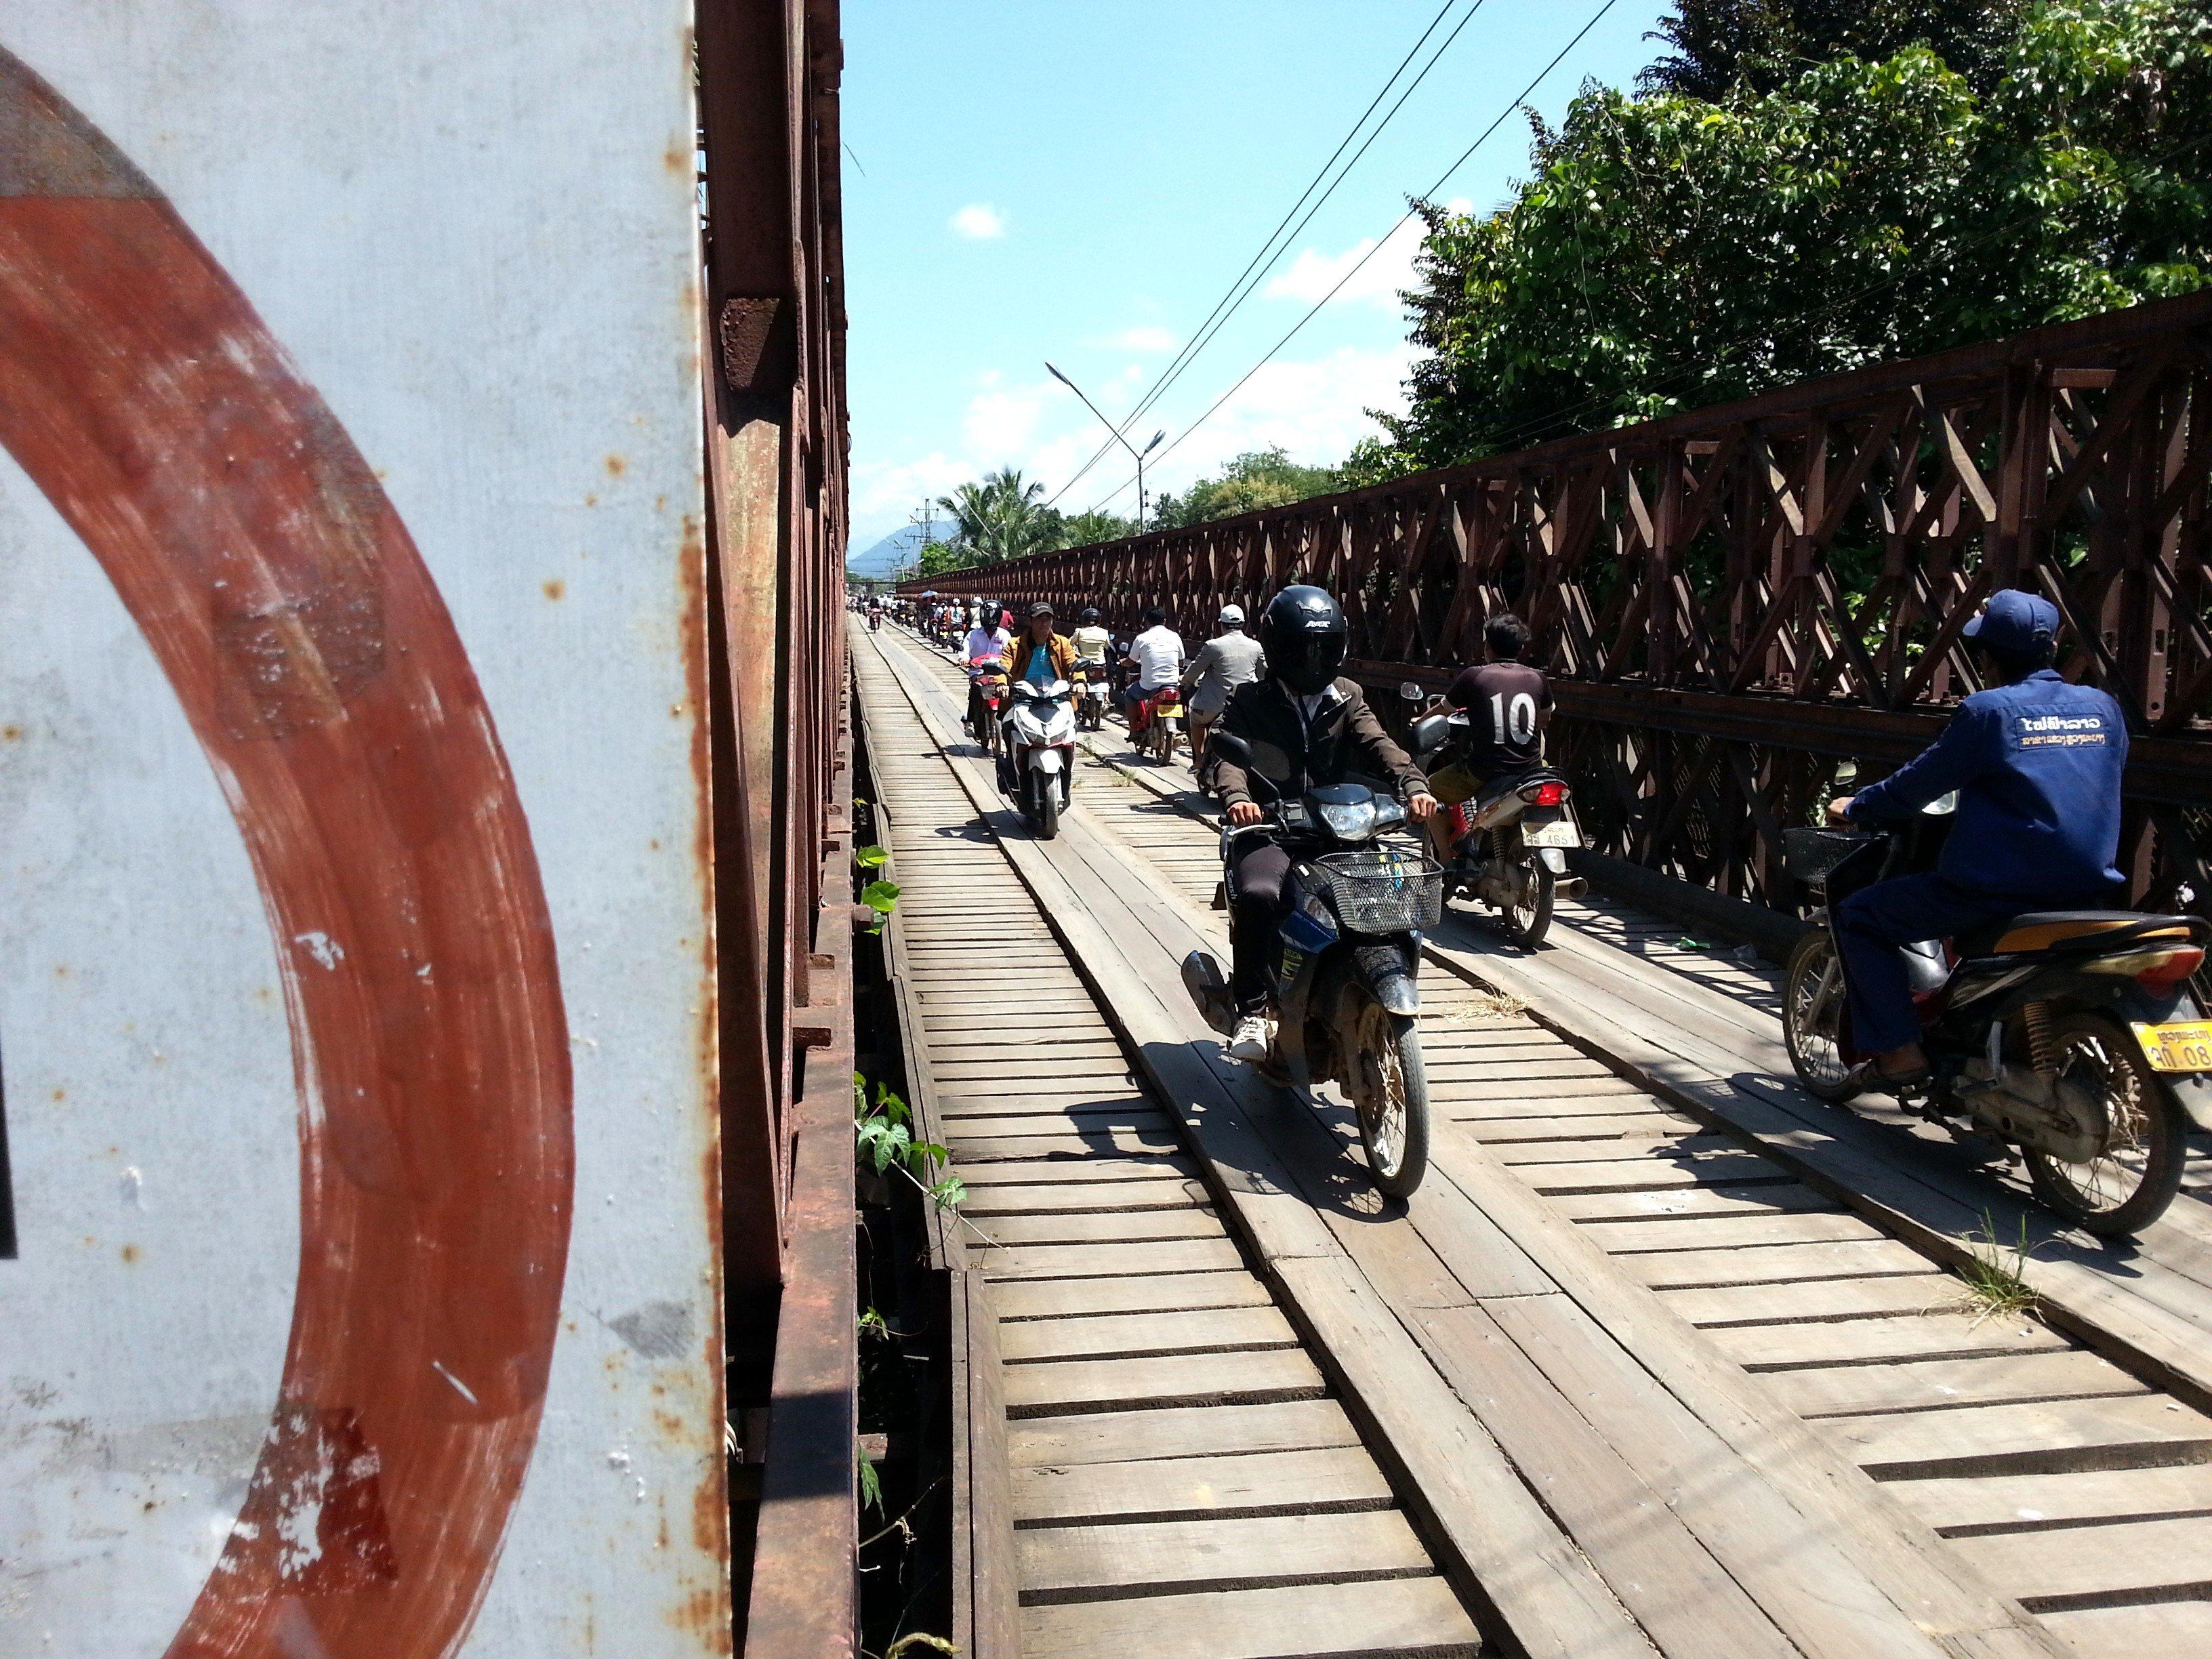 Motorcycles on the Old Bridge in Luang Prabang